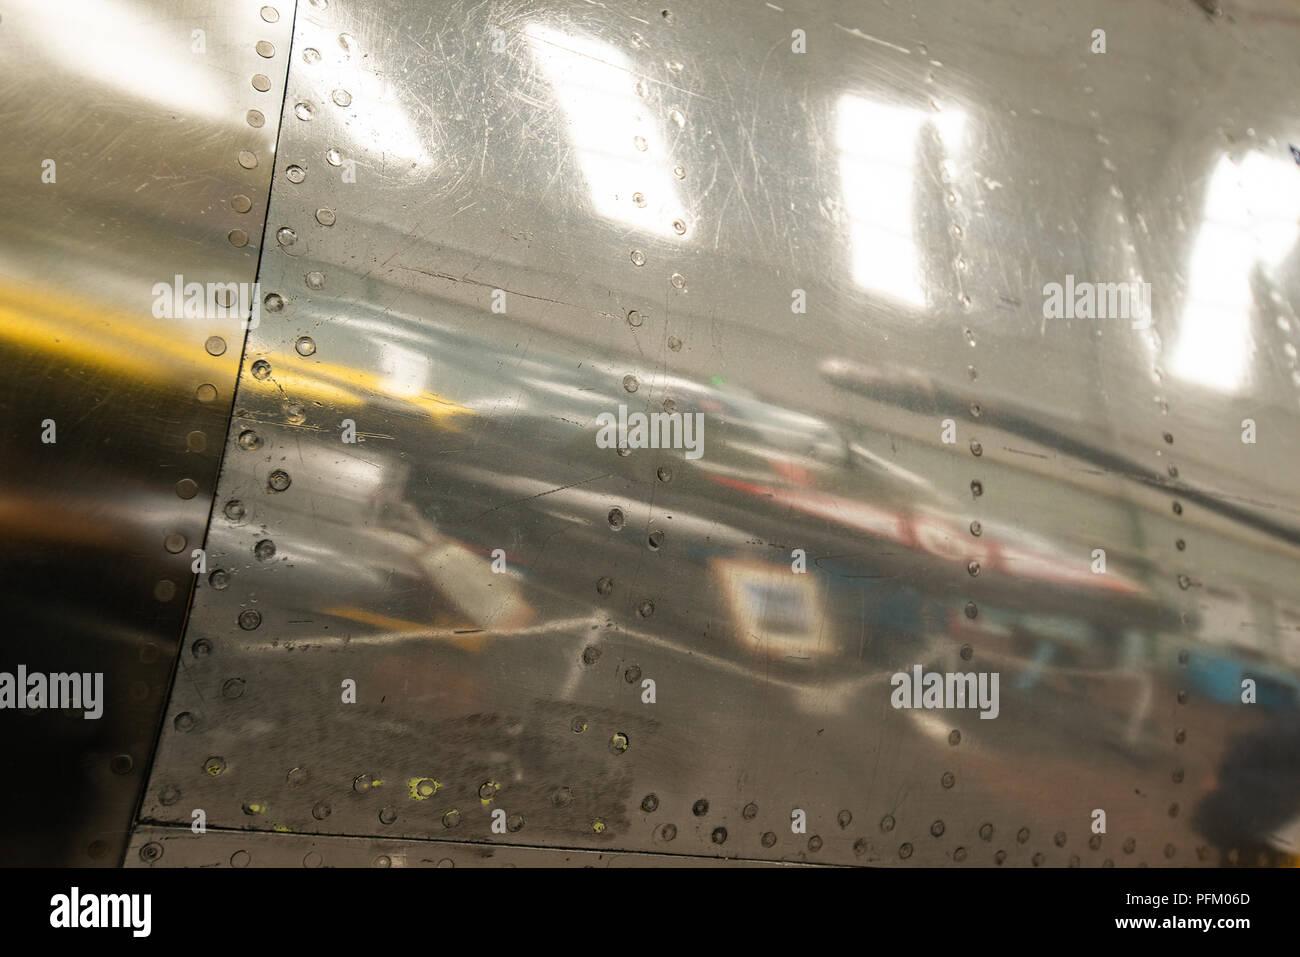 Close up of aircraft body aluminium Stock Photo: 216183477 - Alamy